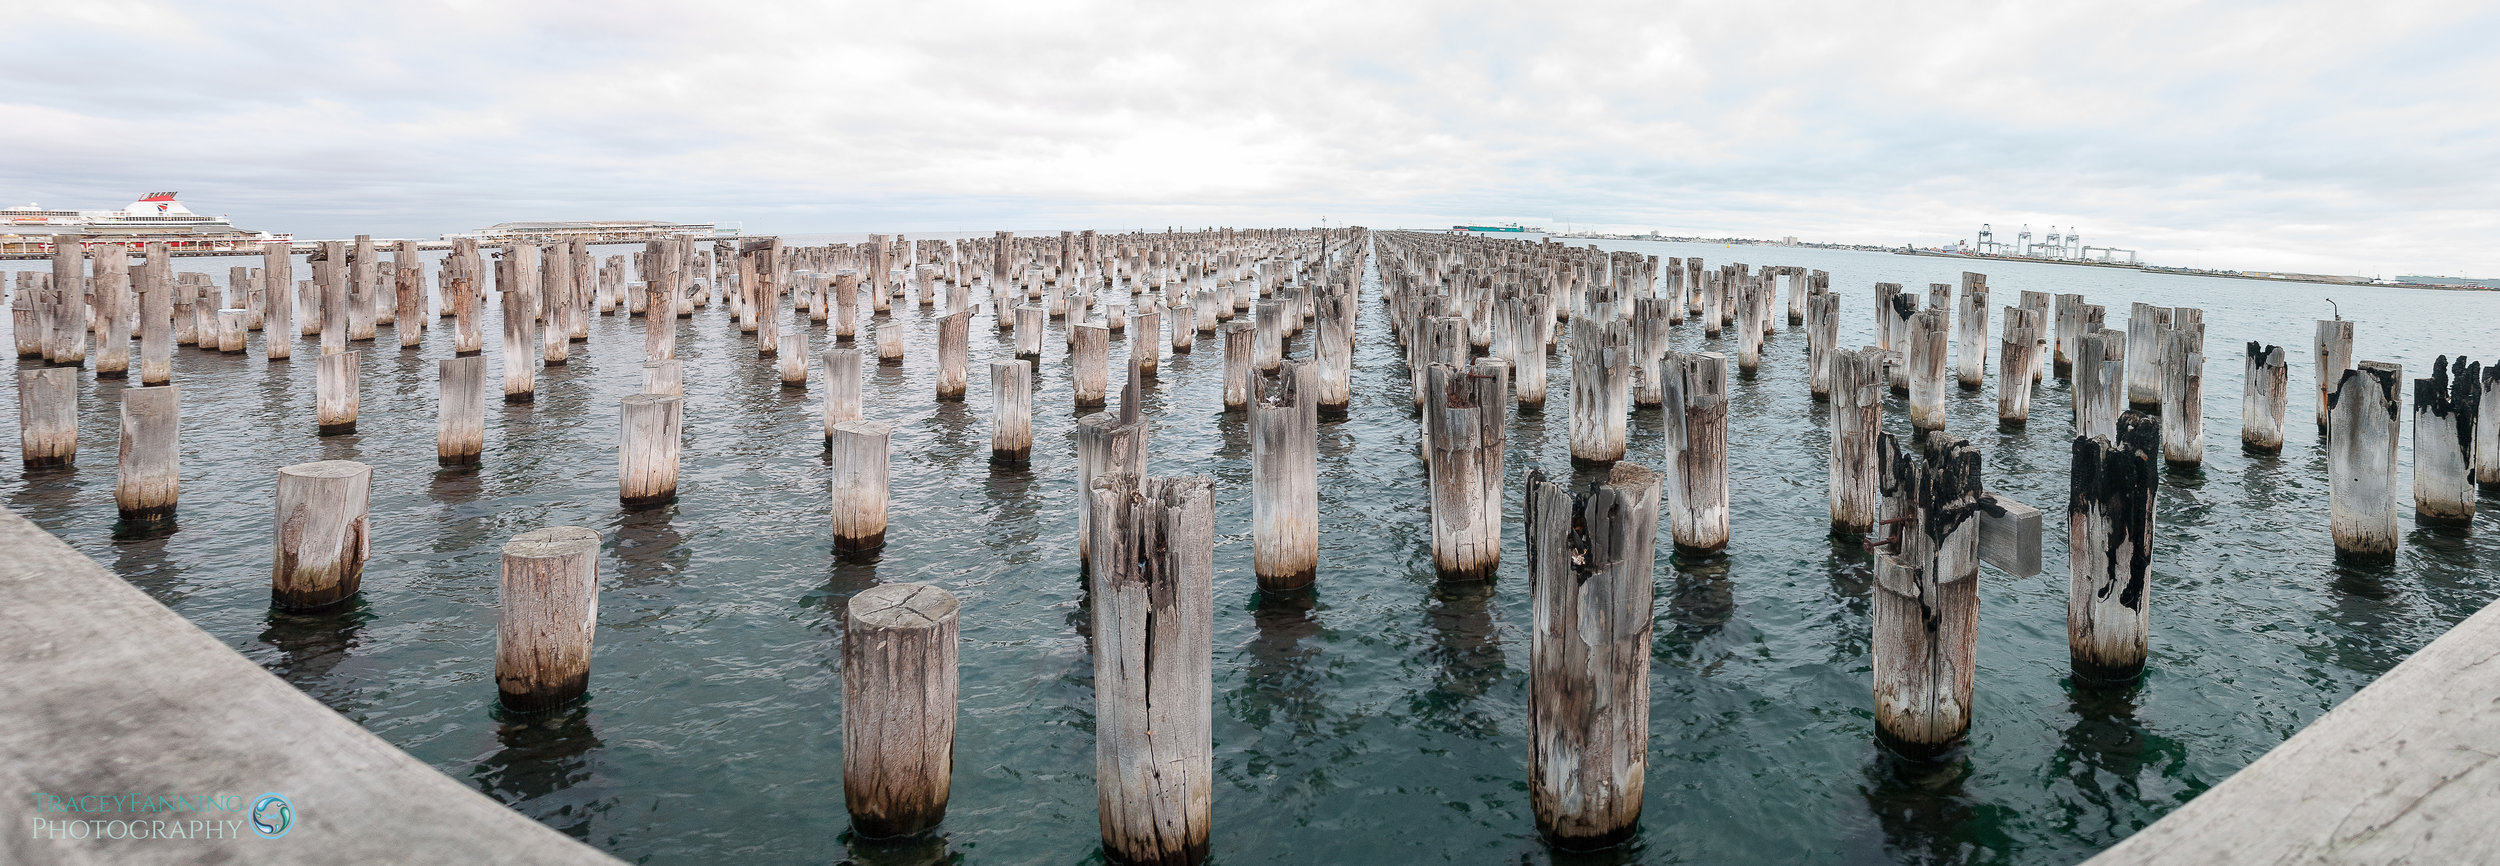 Princes Pier Port Melbourne Panorama.jpg